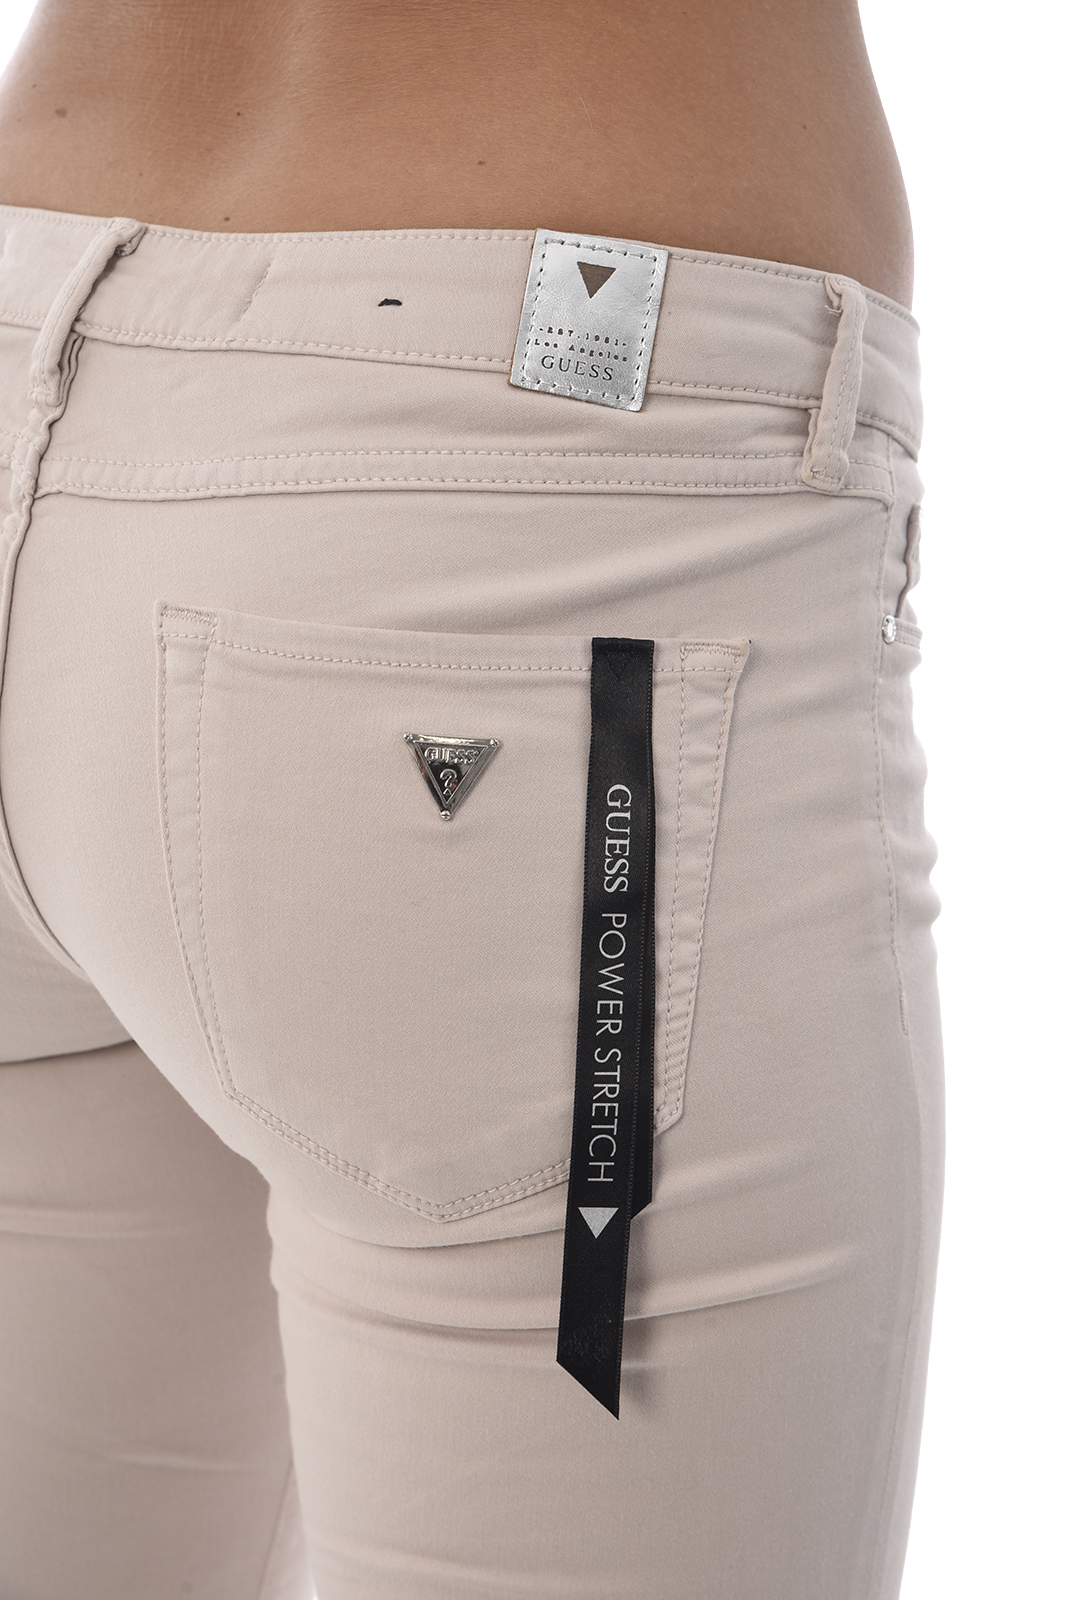 FEMME  Guess jeans W64A31 W77R2 skinny G430 HUSHED VIOLET